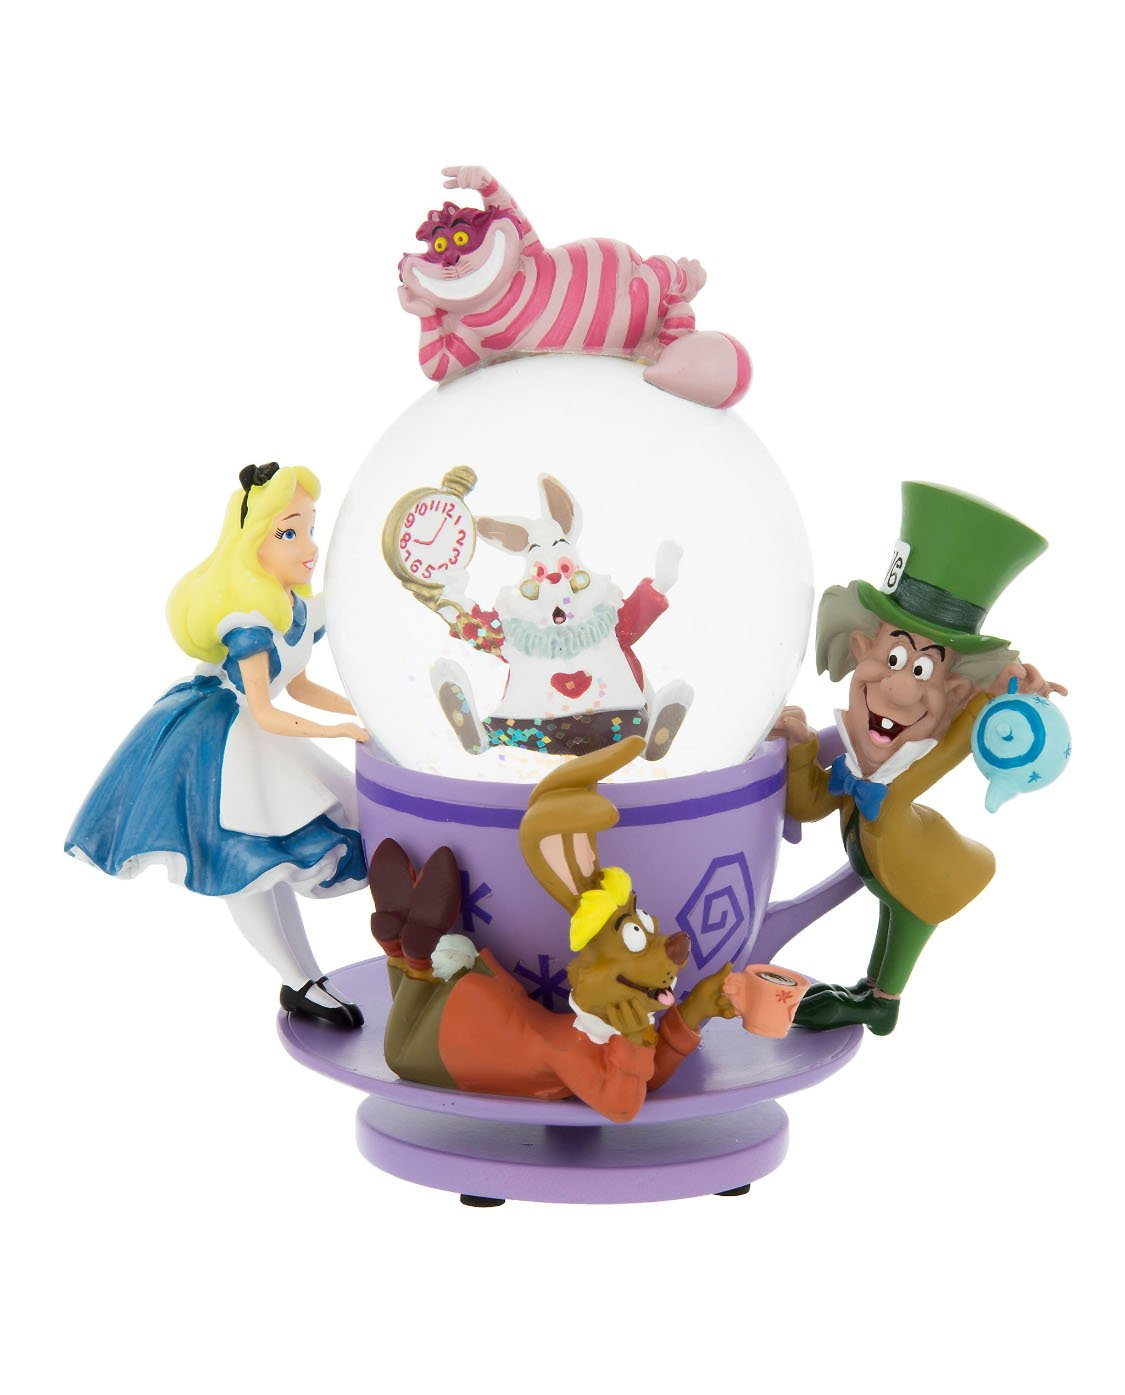 Disney Parks Exclusive Alice in Wonderland Tea Party Spinning Snowglobe